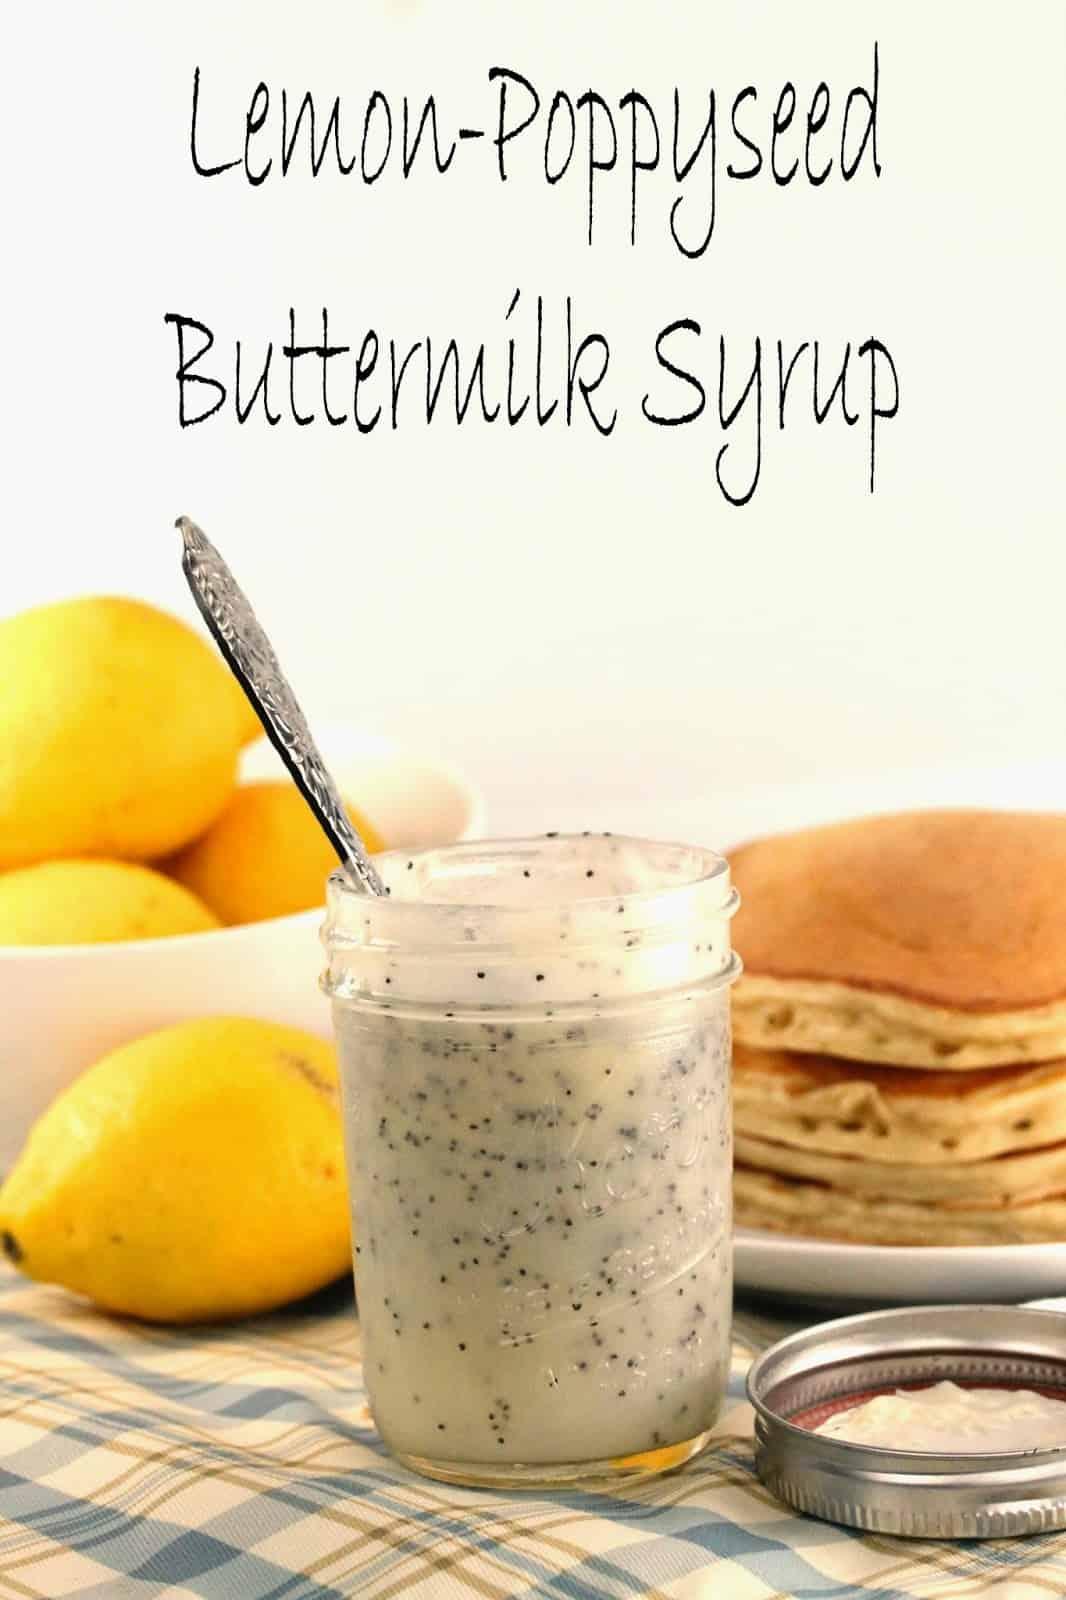 Lemon poppyseed buttermilk syrup in a mason jar